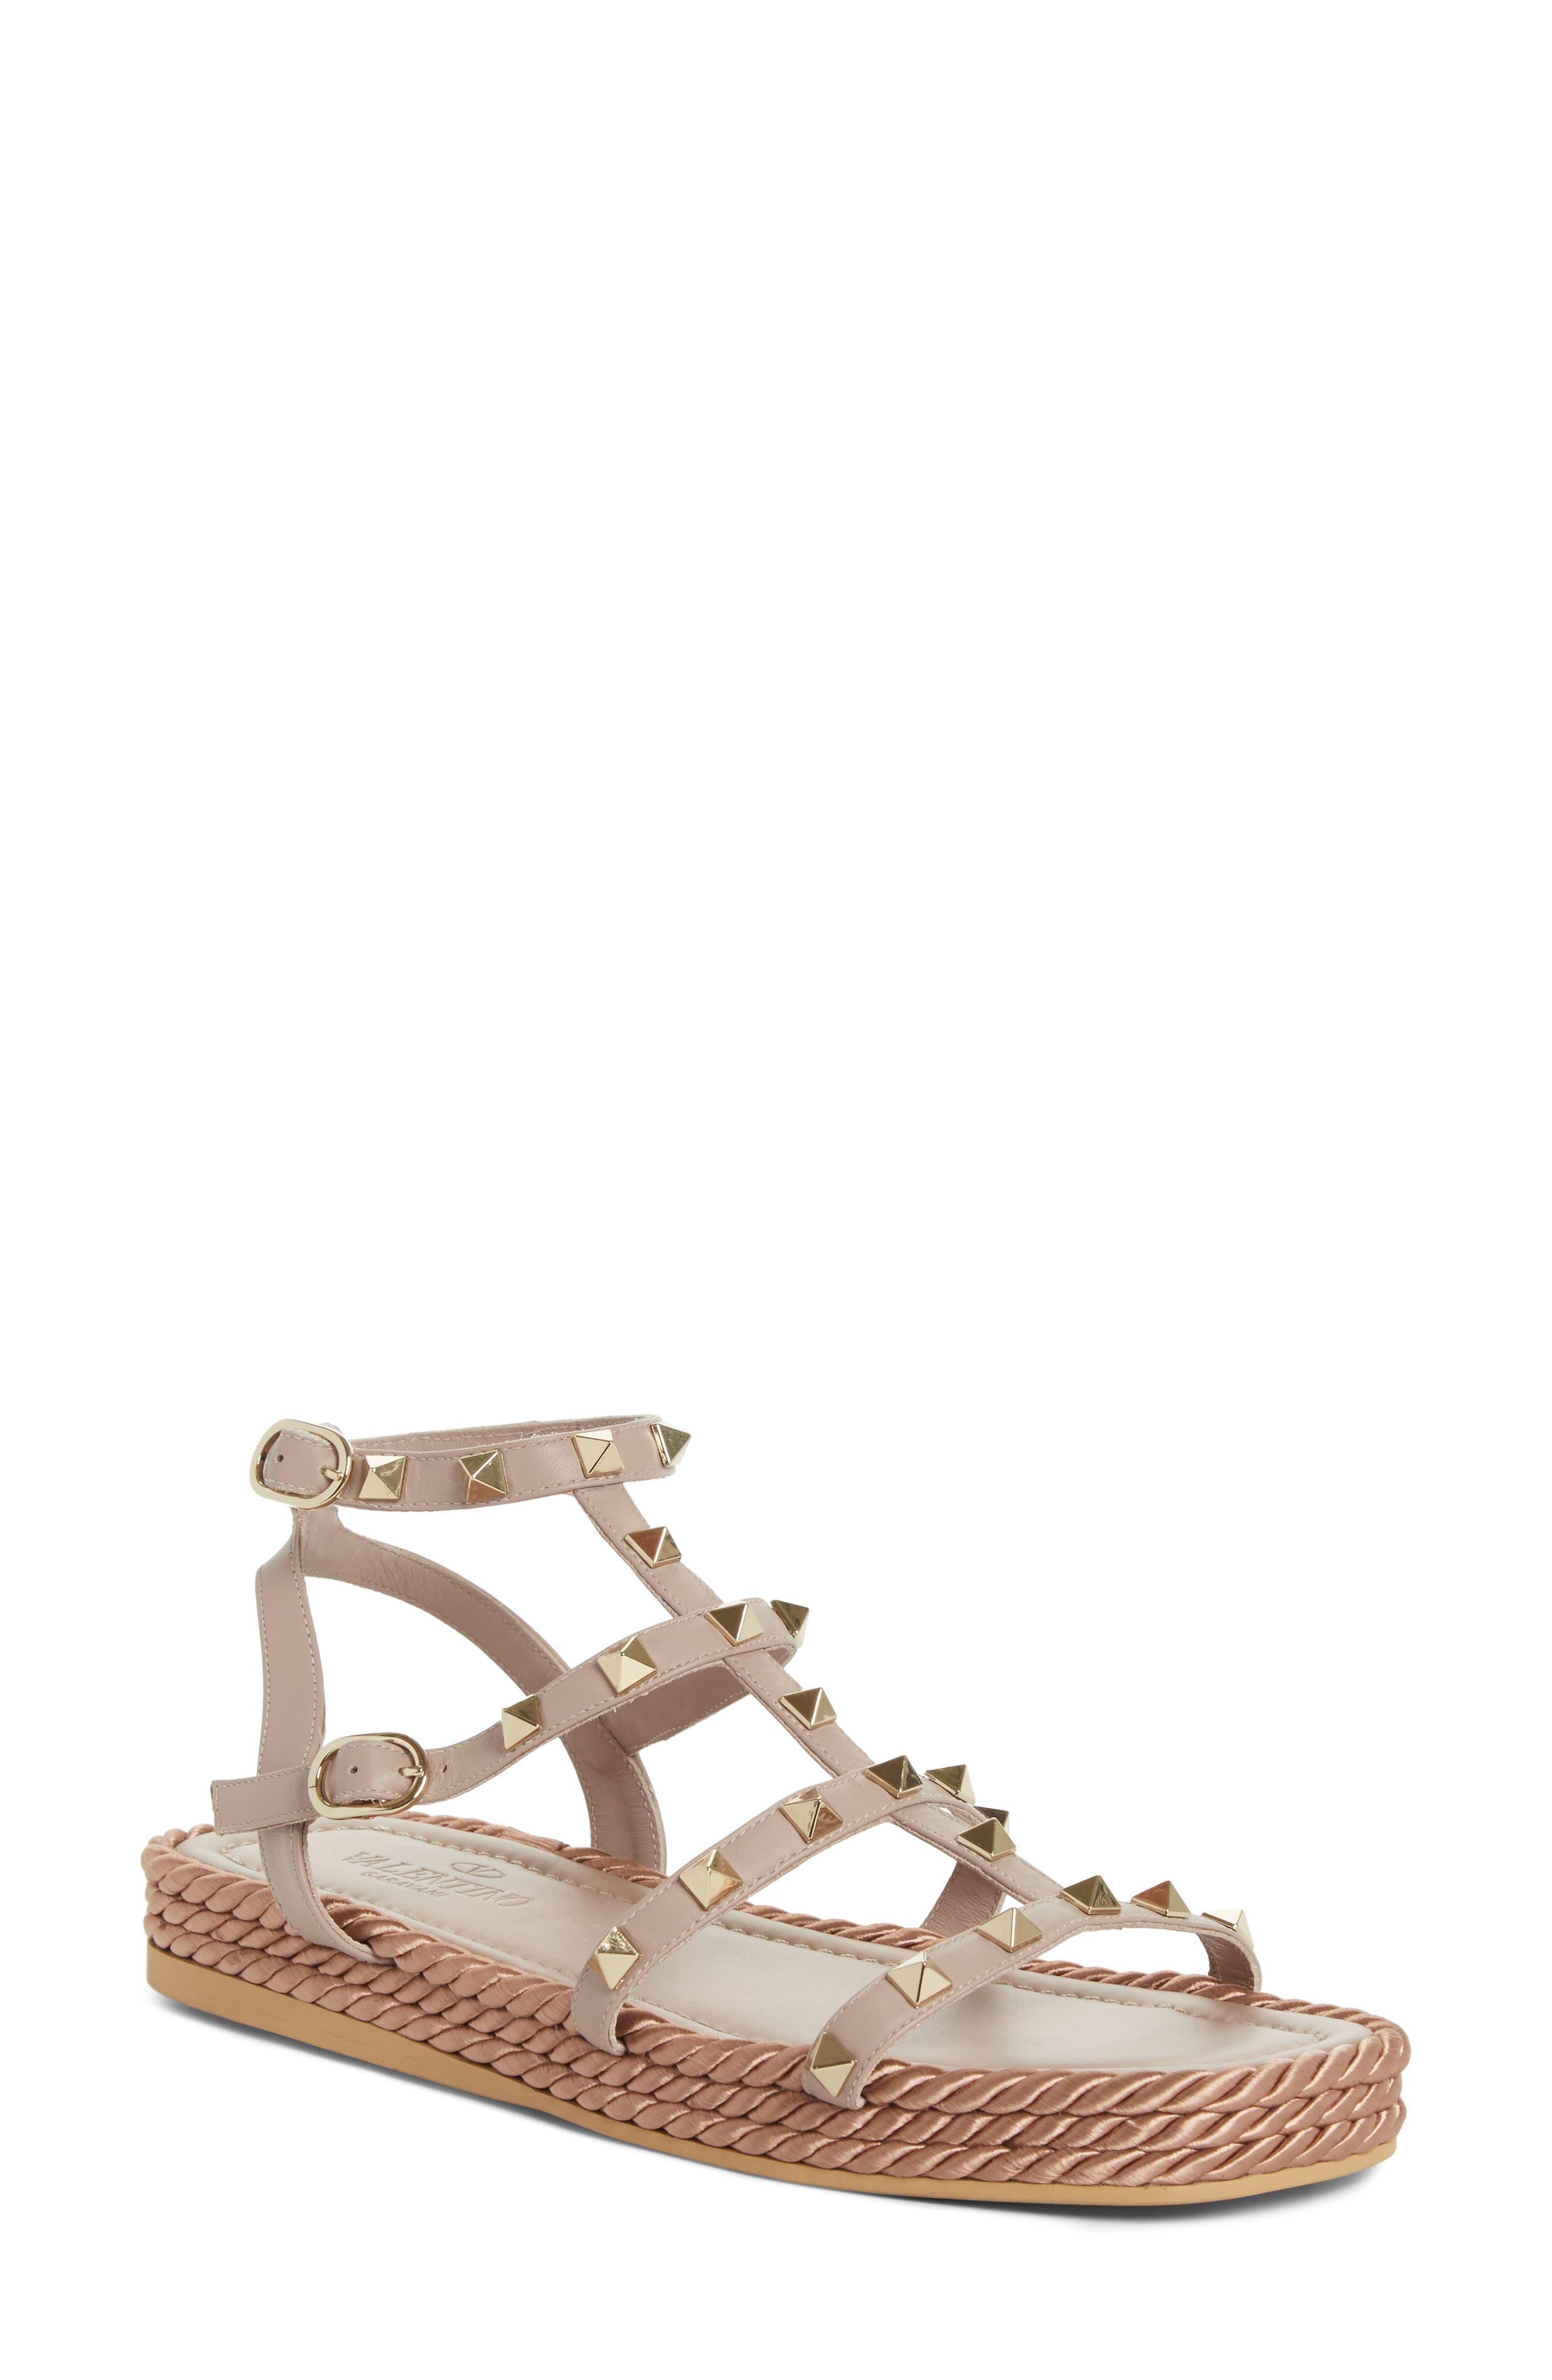 Torchon Strappy Sandal,                         Main,                         color, Beige